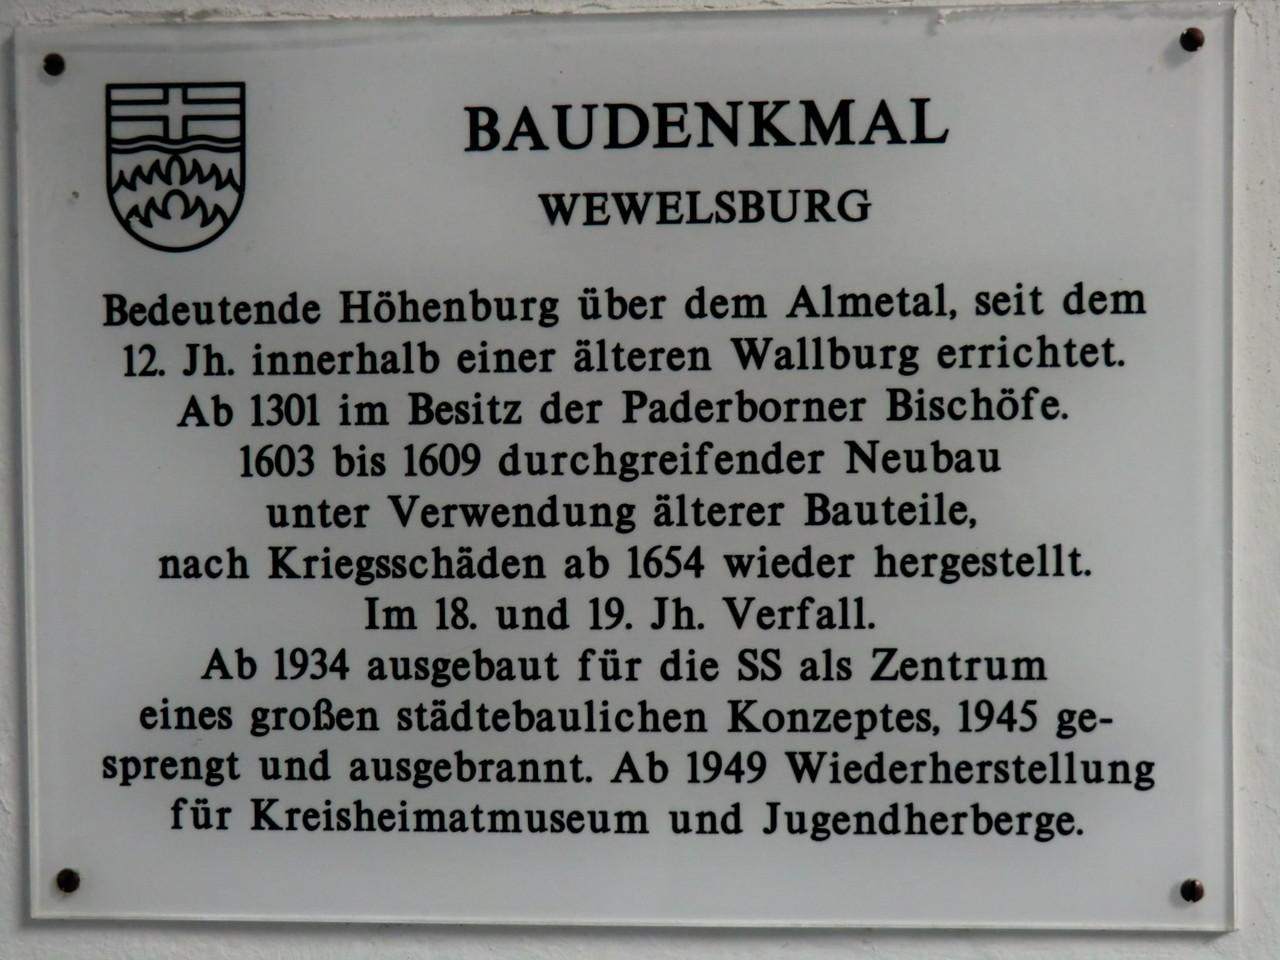 http://de.wikipedia.org/wiki/Wewelsburg